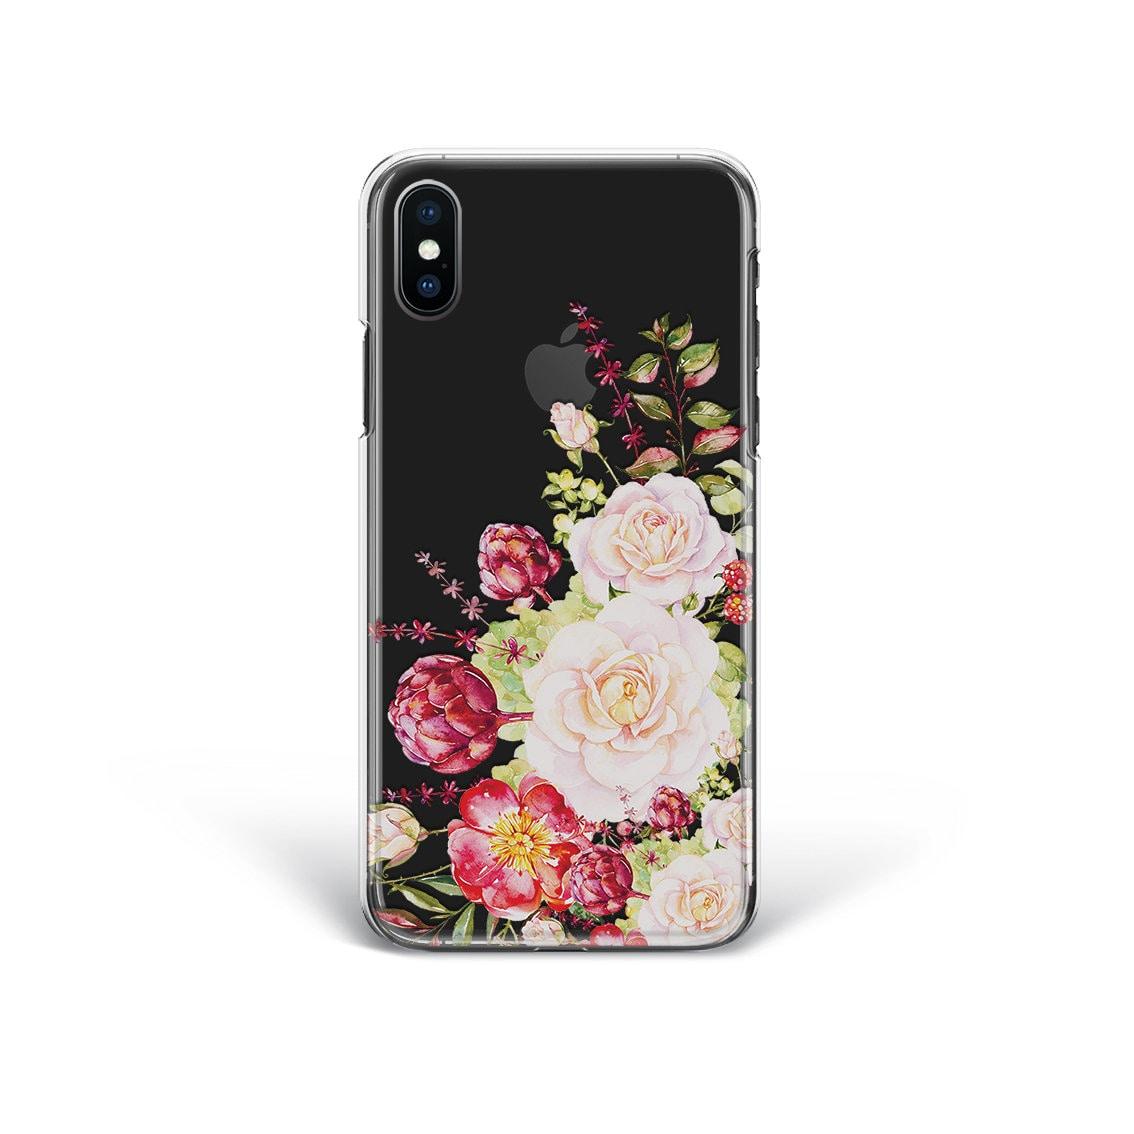 Iphone 8 Case Floral Iphone 7 Plus Case Flowers Google Pixel Etsy